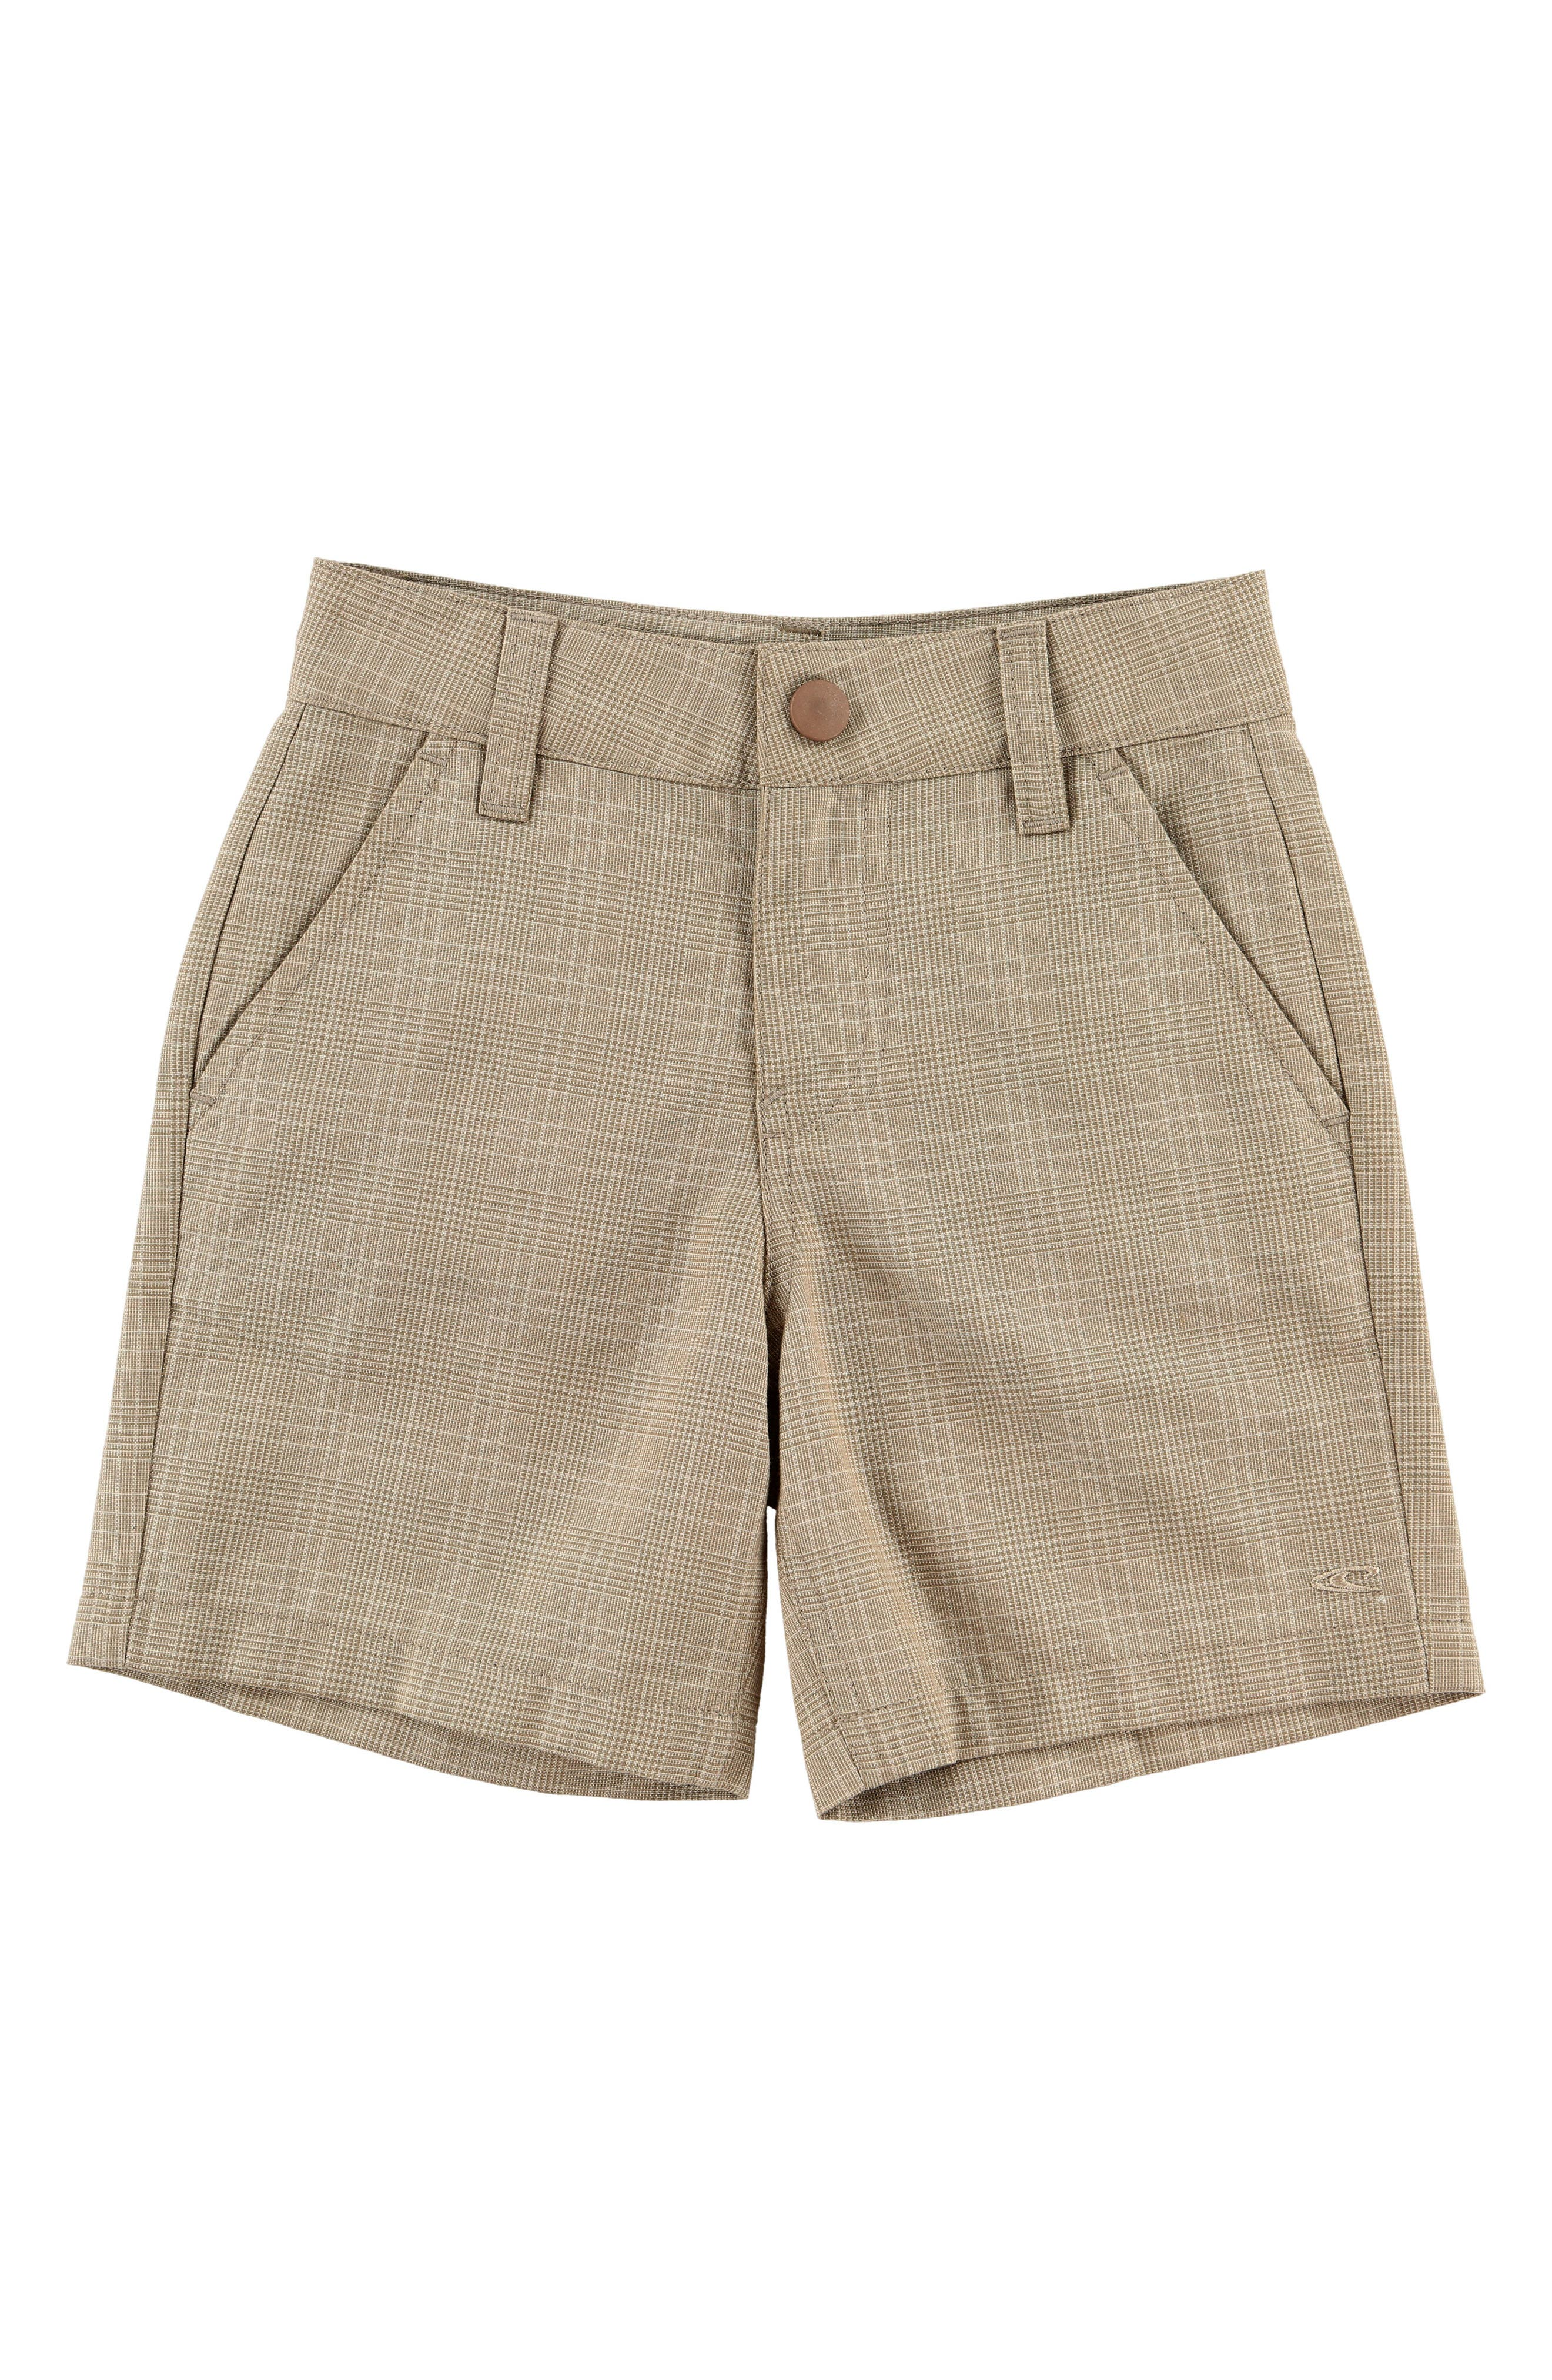 Delta Plaid Shorts,                             Main thumbnail 1, color,                             Dark Stone